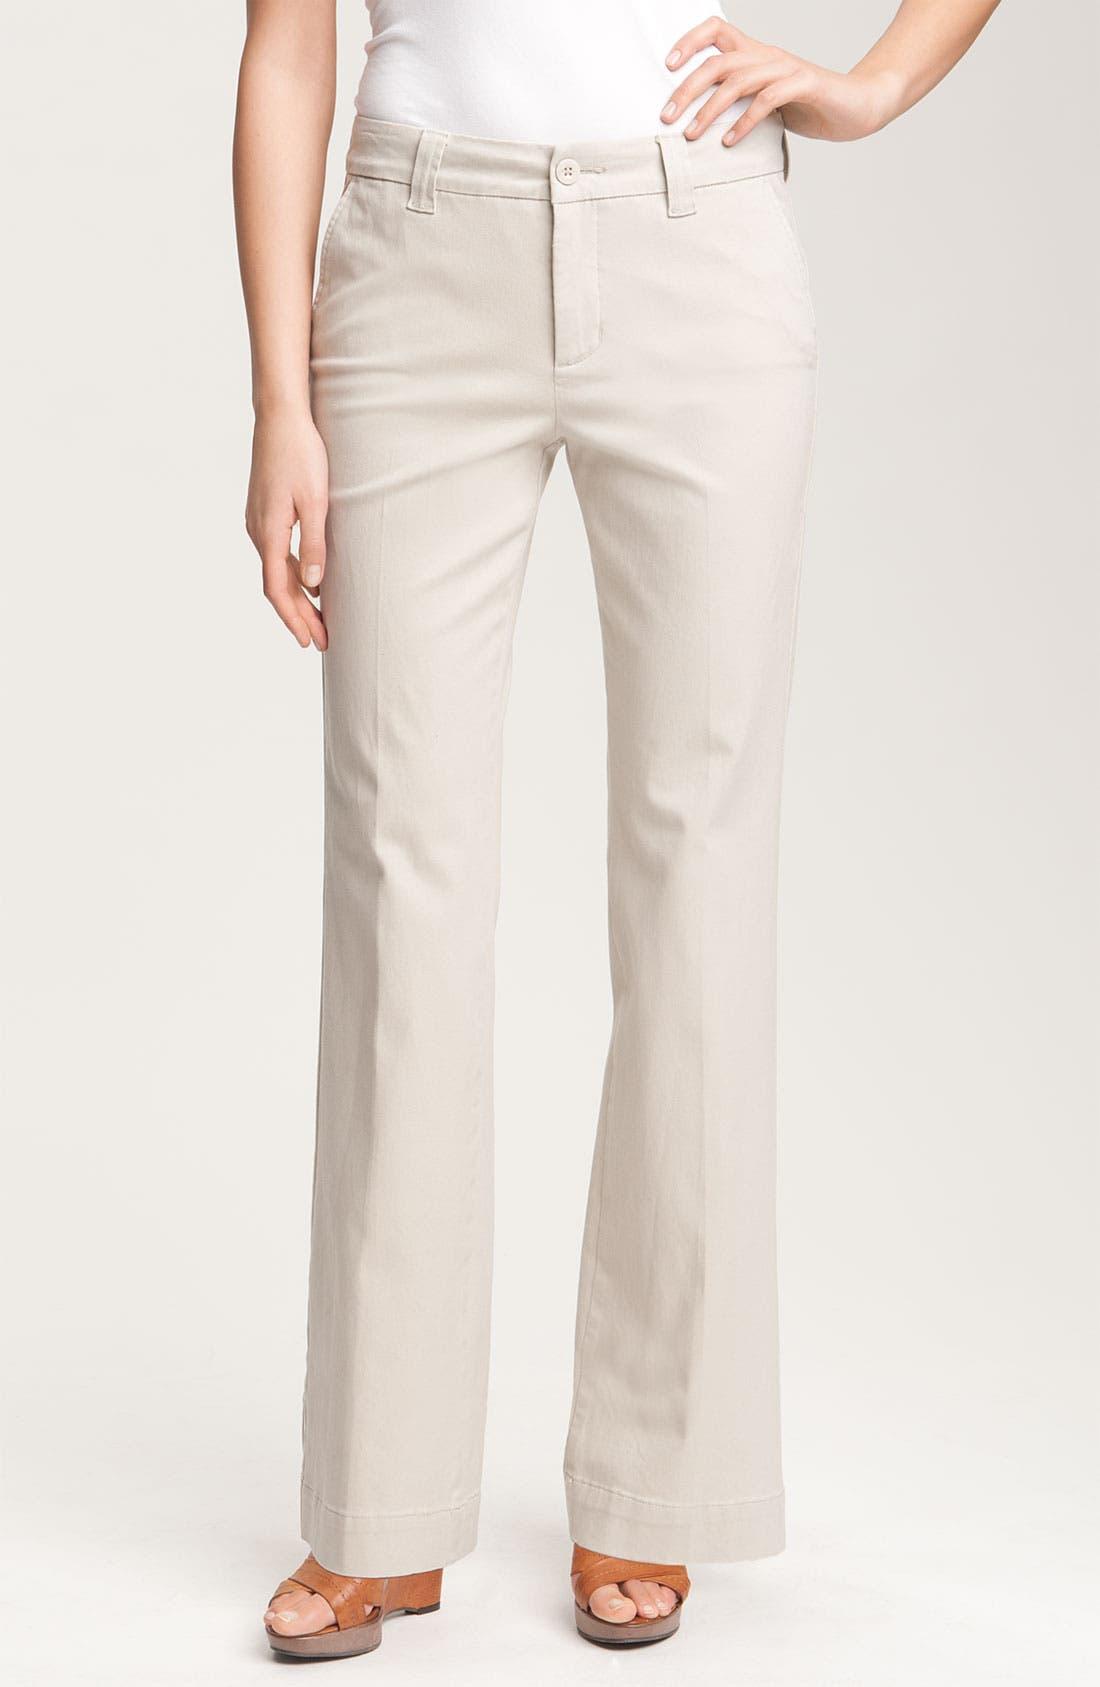 Alternate Image 1 Selected - NYDJ 'Vanessa' Stretch Trousers (Petite)